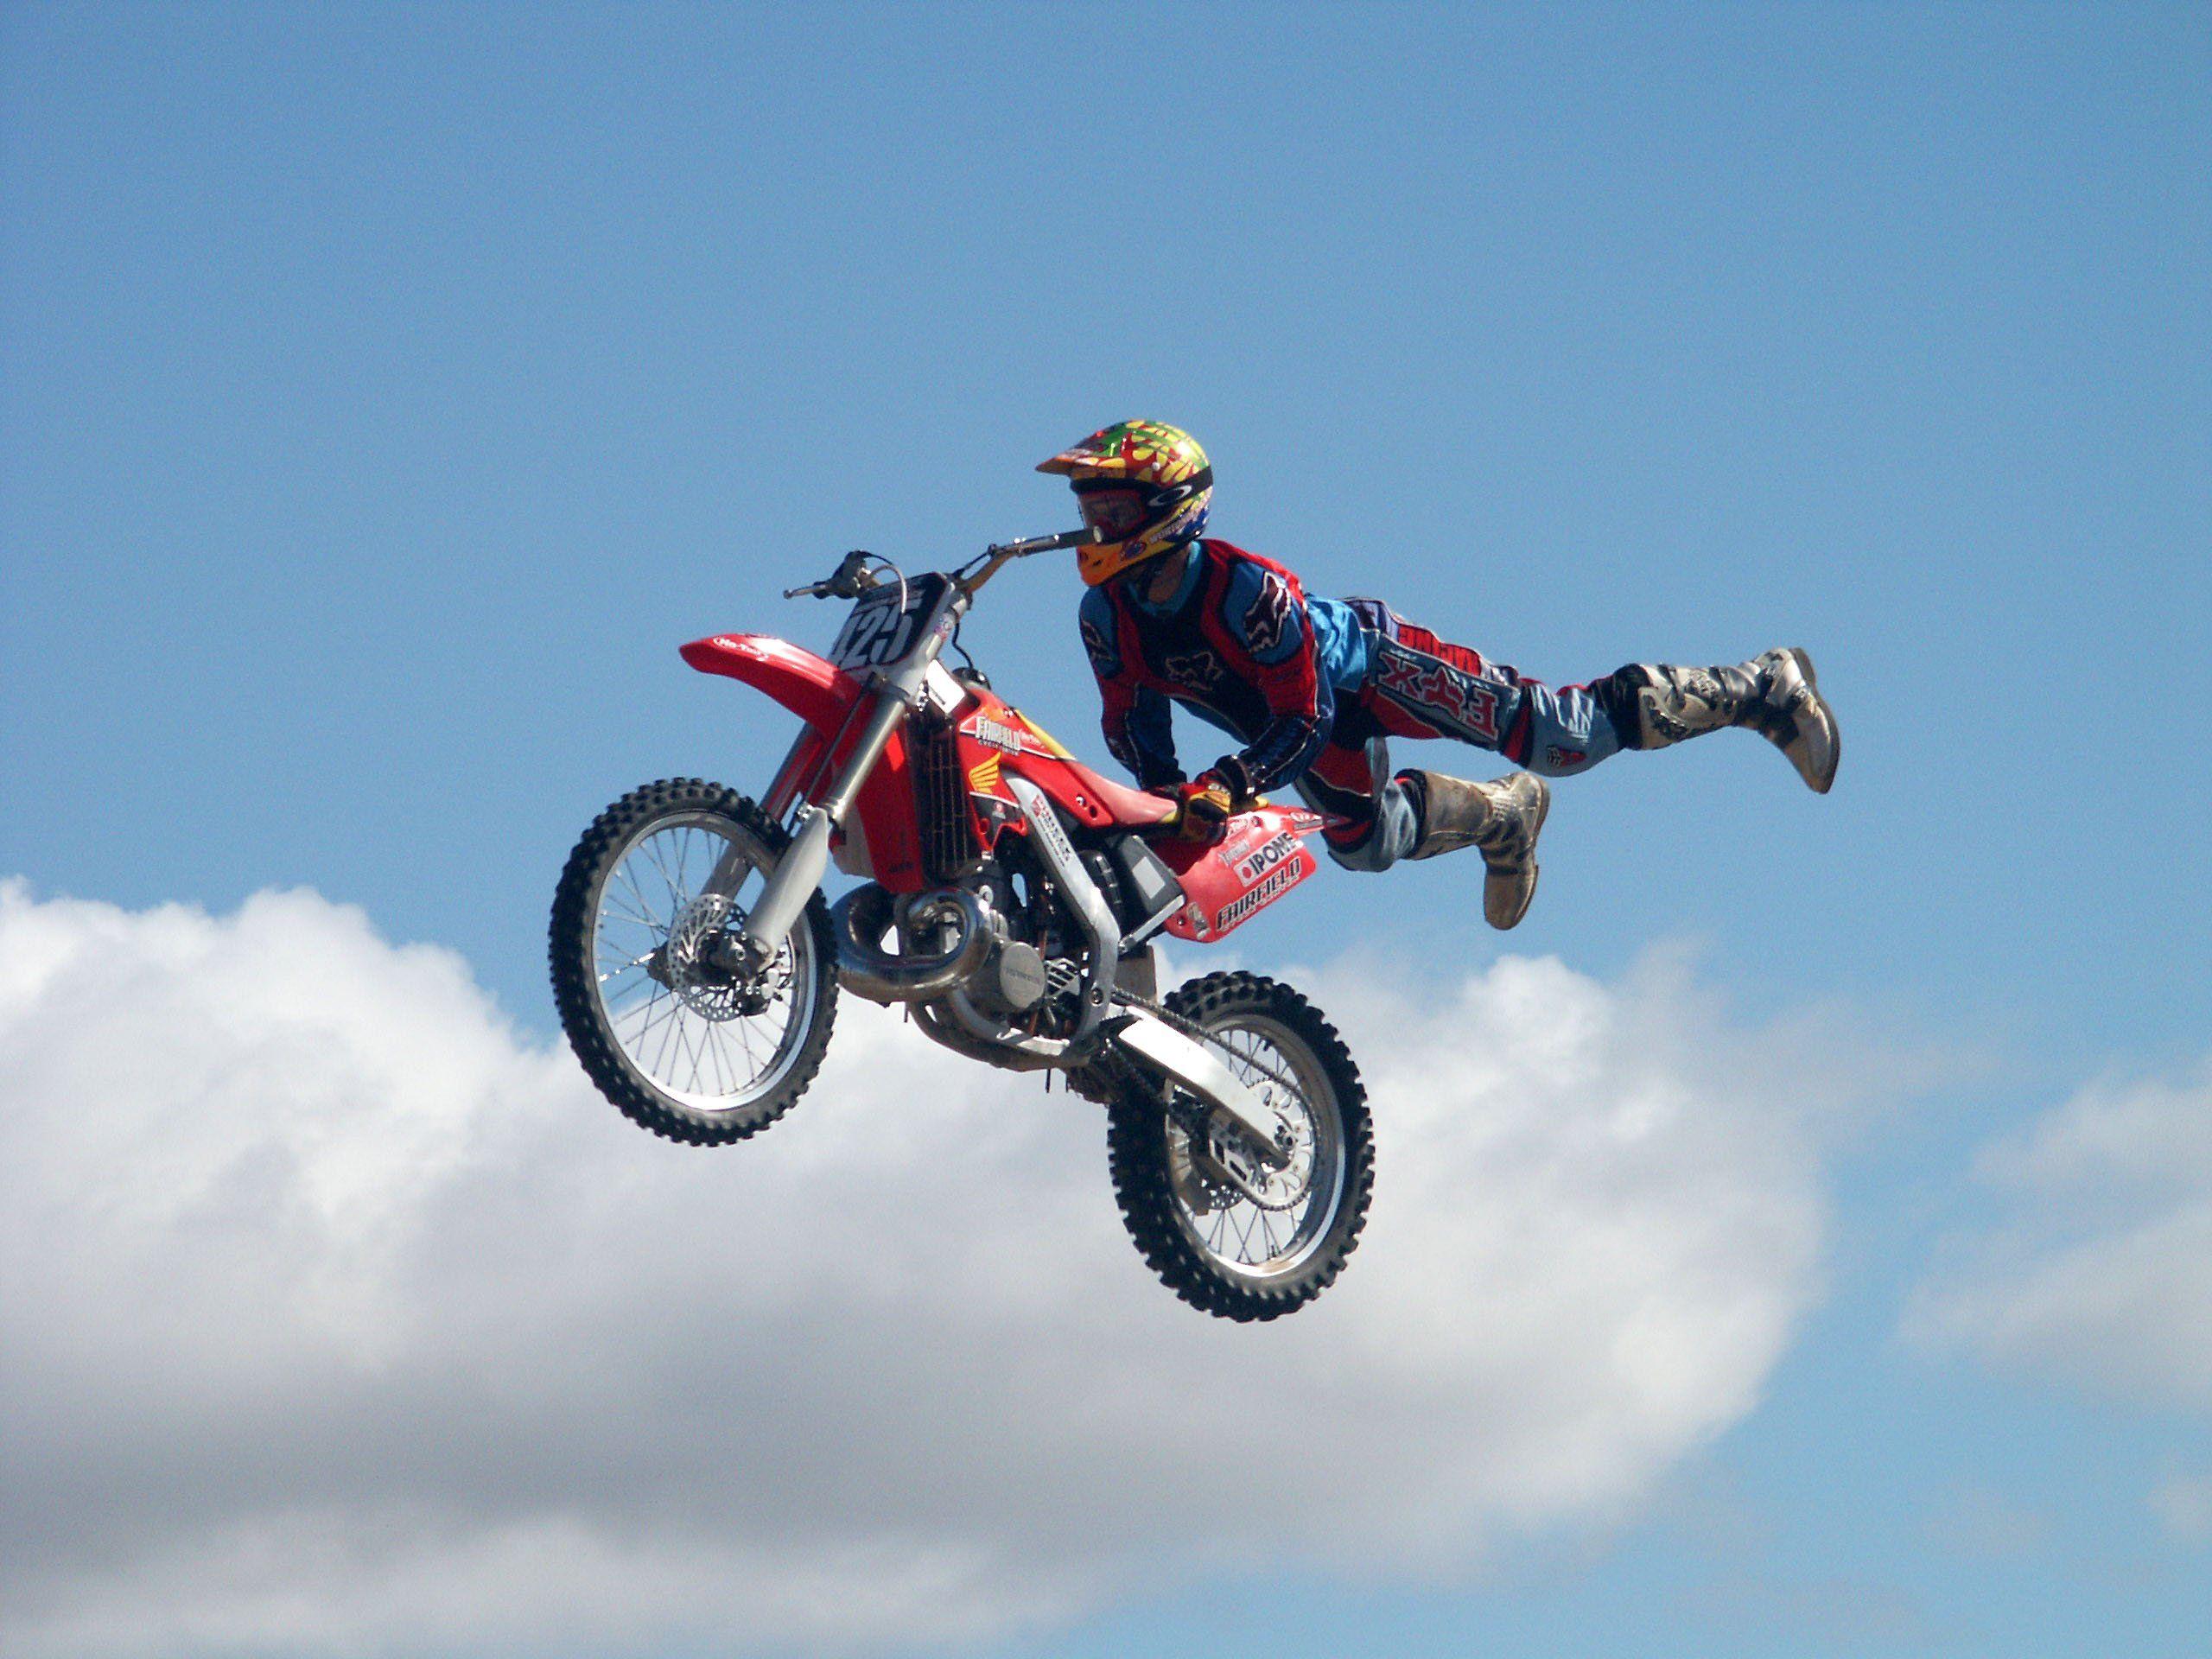 Freestyle Dirtbike Motocross Moto Bike Extreme Motorbike Dirt